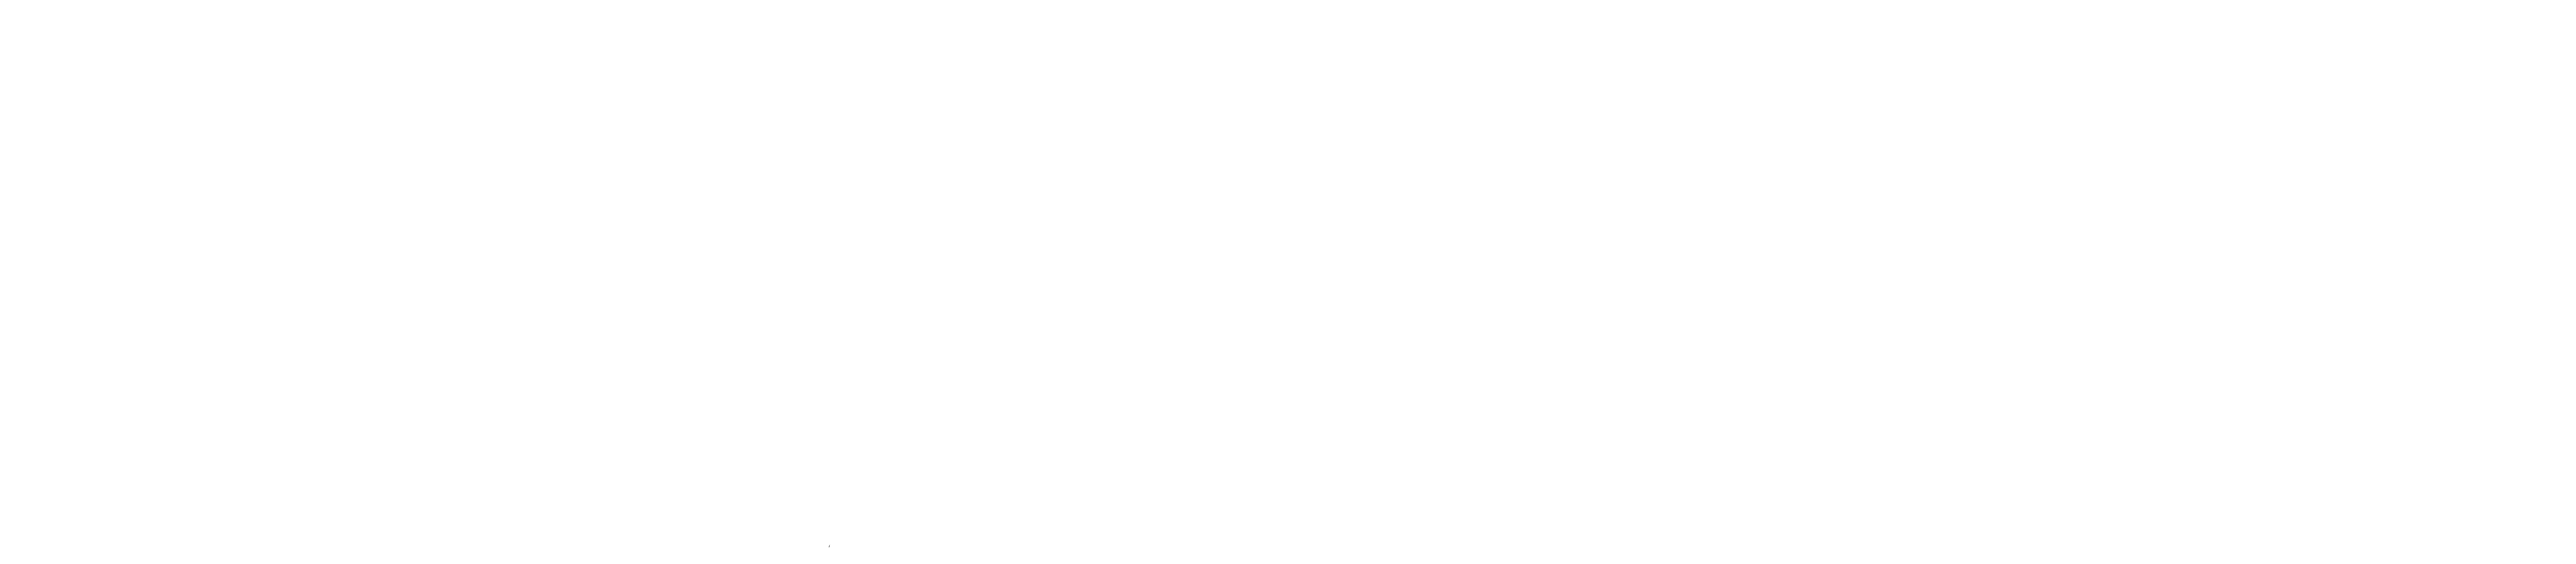 Adapteye